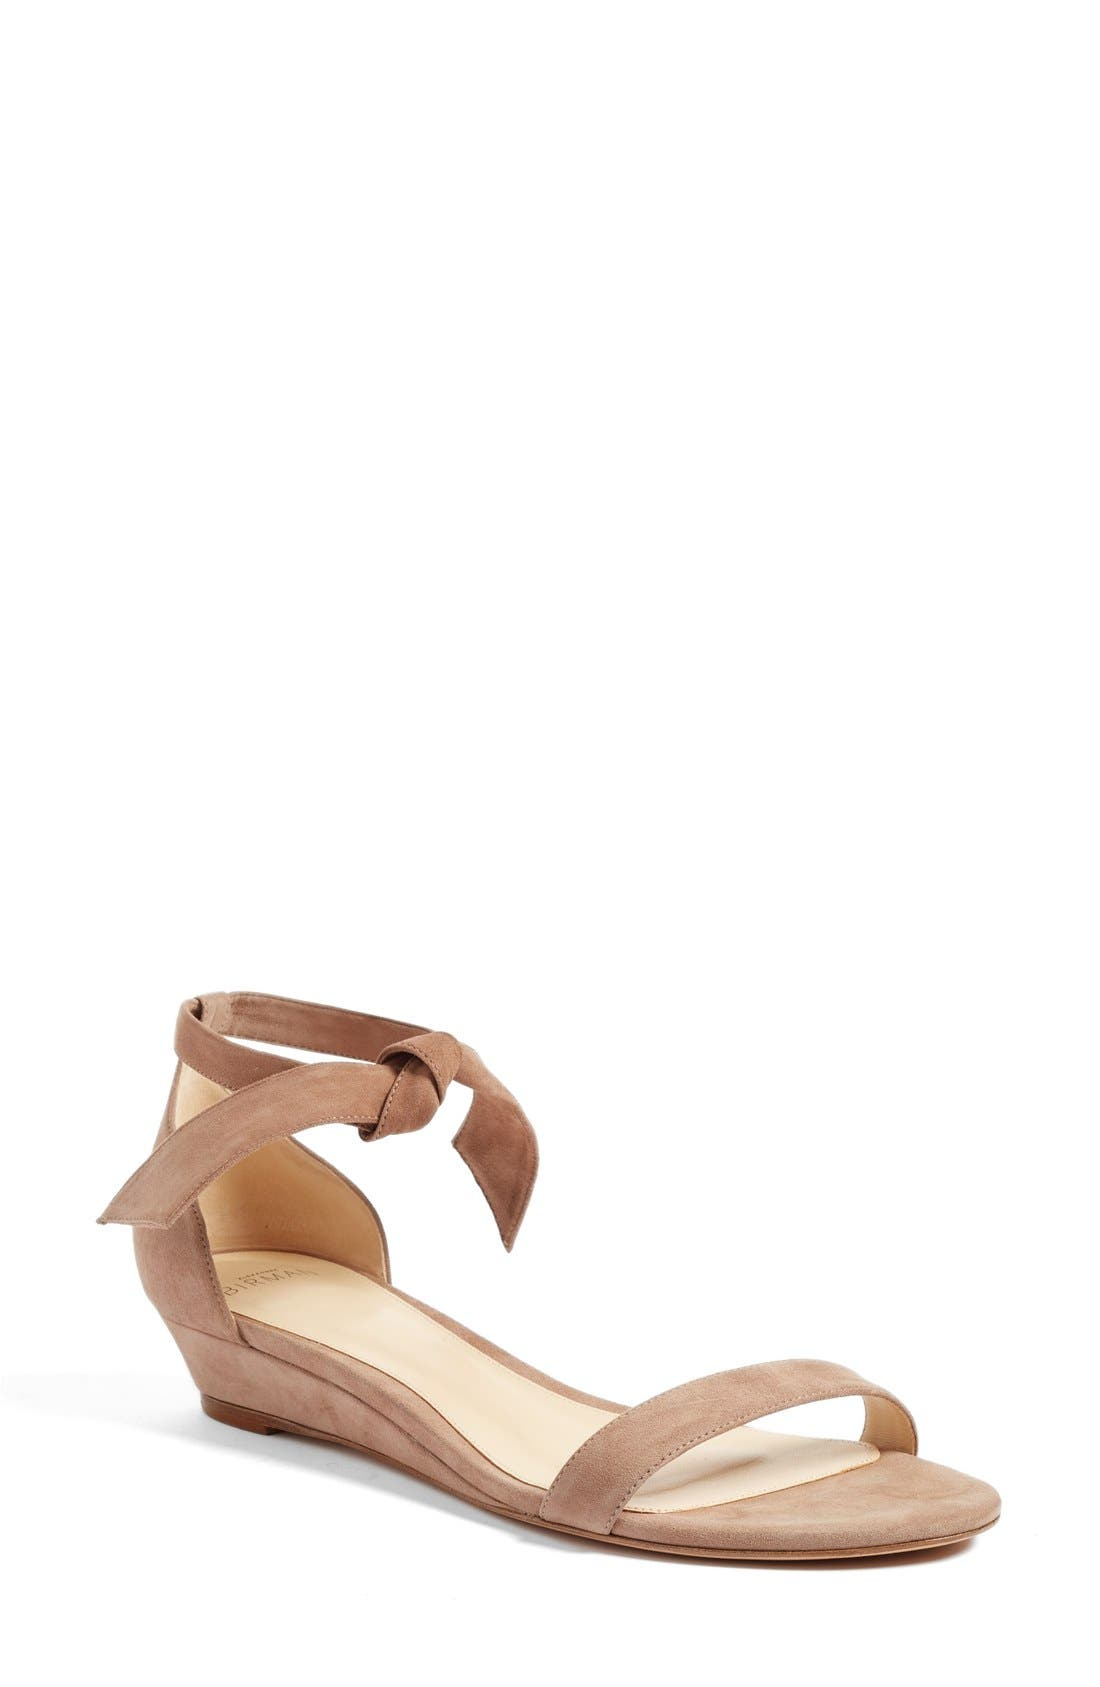 Alternate Image 1 Selected - Alexandre Birman Atena Tie Strap Wedge Sandal (Women)